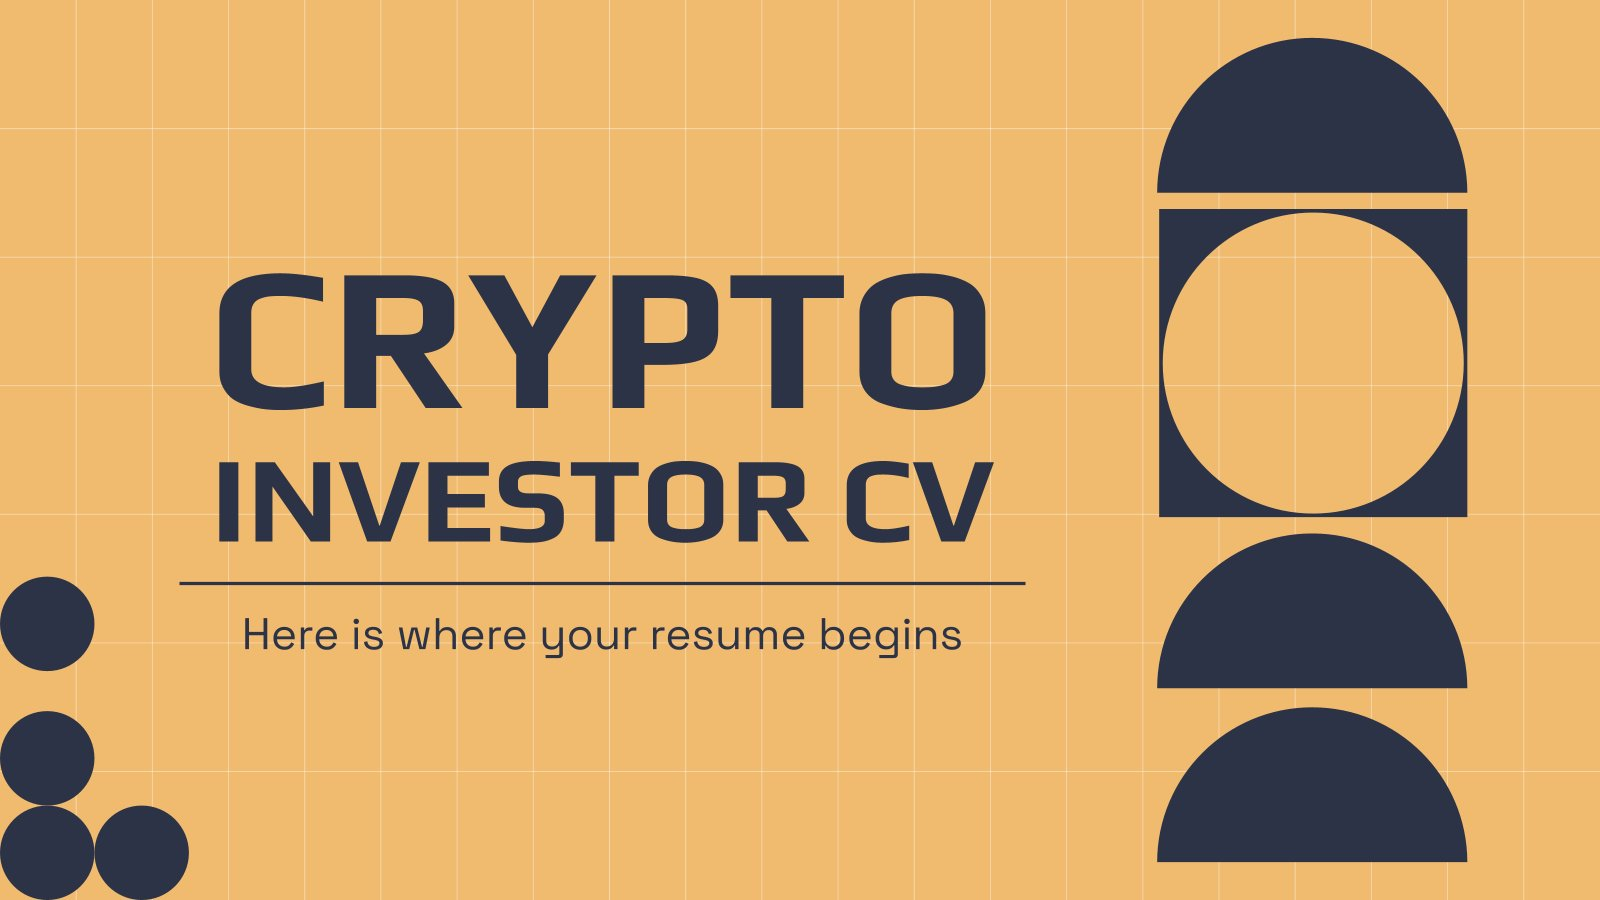 Crypto Investor CV Minithema Präsentationsvorlage